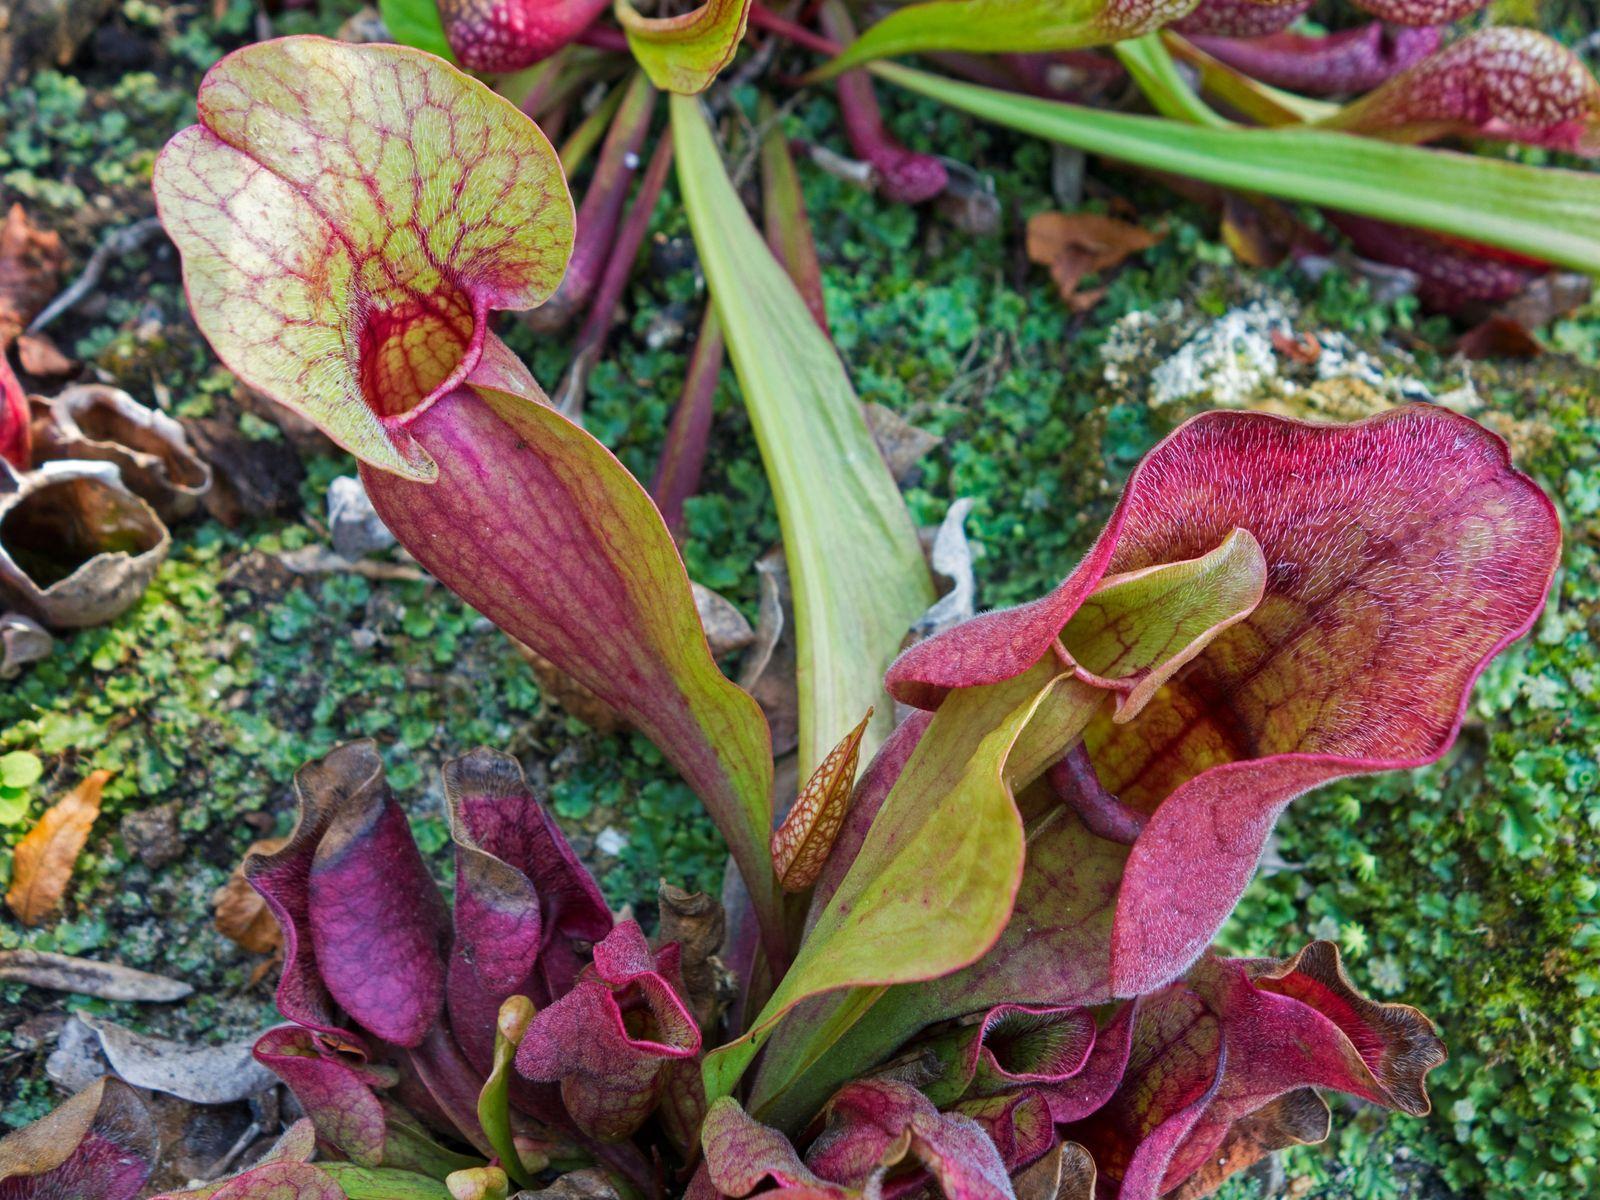 The northern pitcher plant (Sarracenia purpurea) has a taste for salamanders.